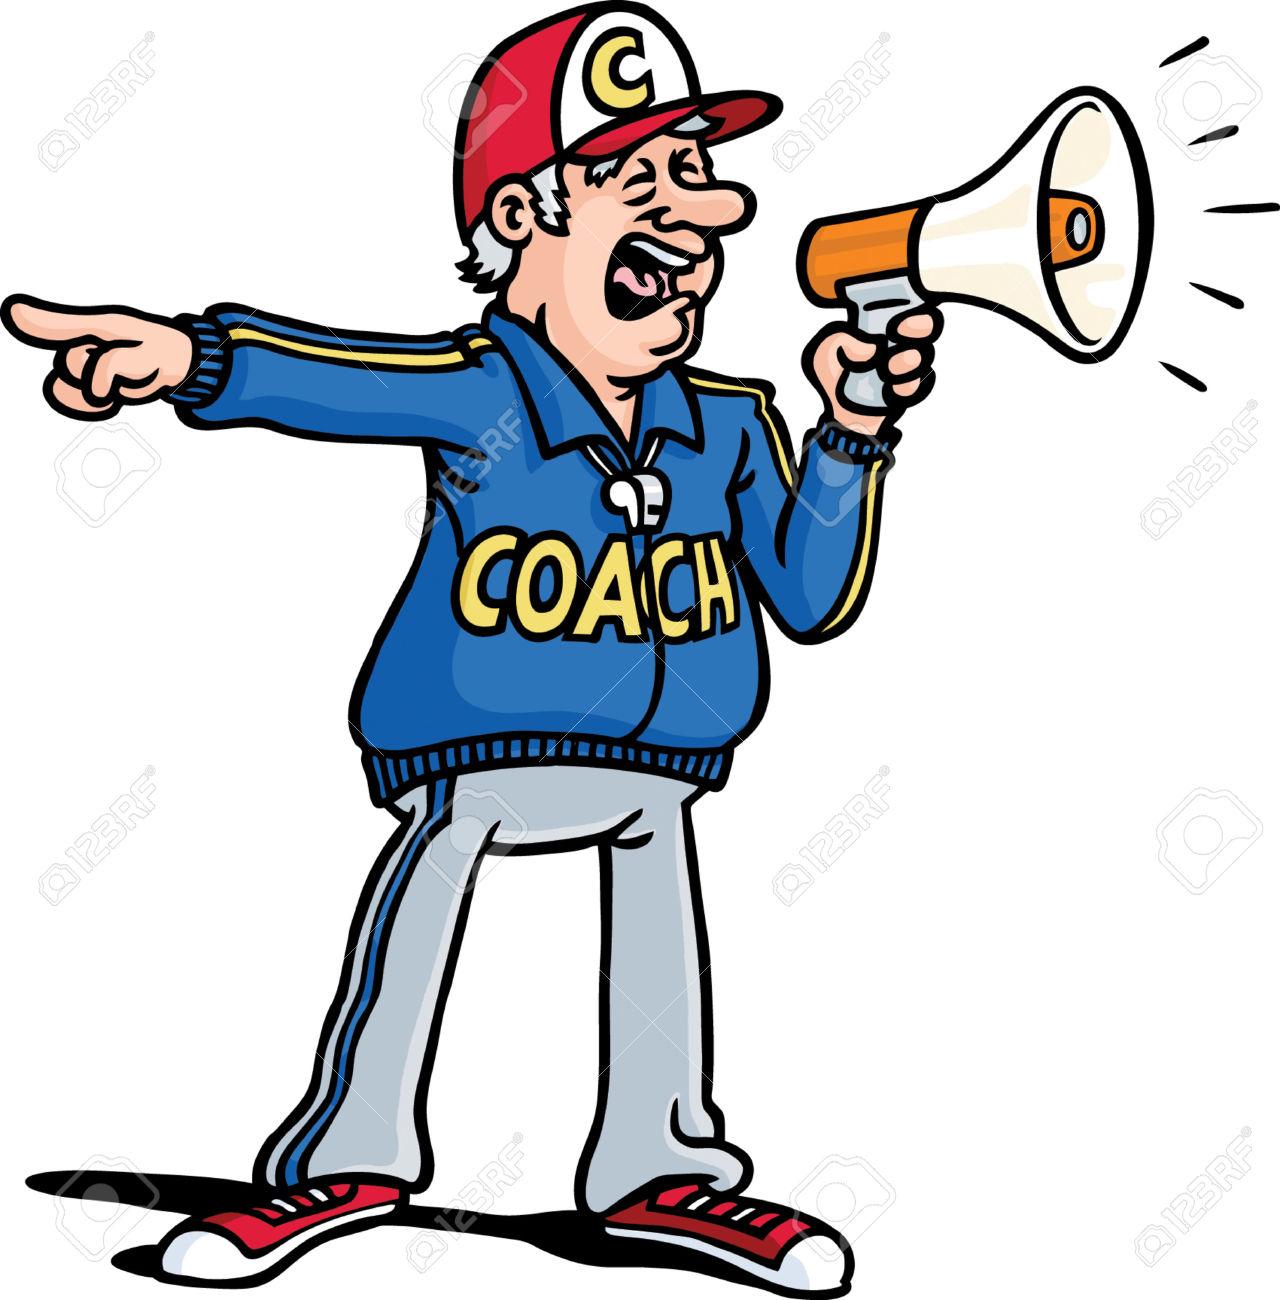 Clipart of a coach grabbing a football player clip royalty free library coach | Bondo- the real deal clip royalty free library